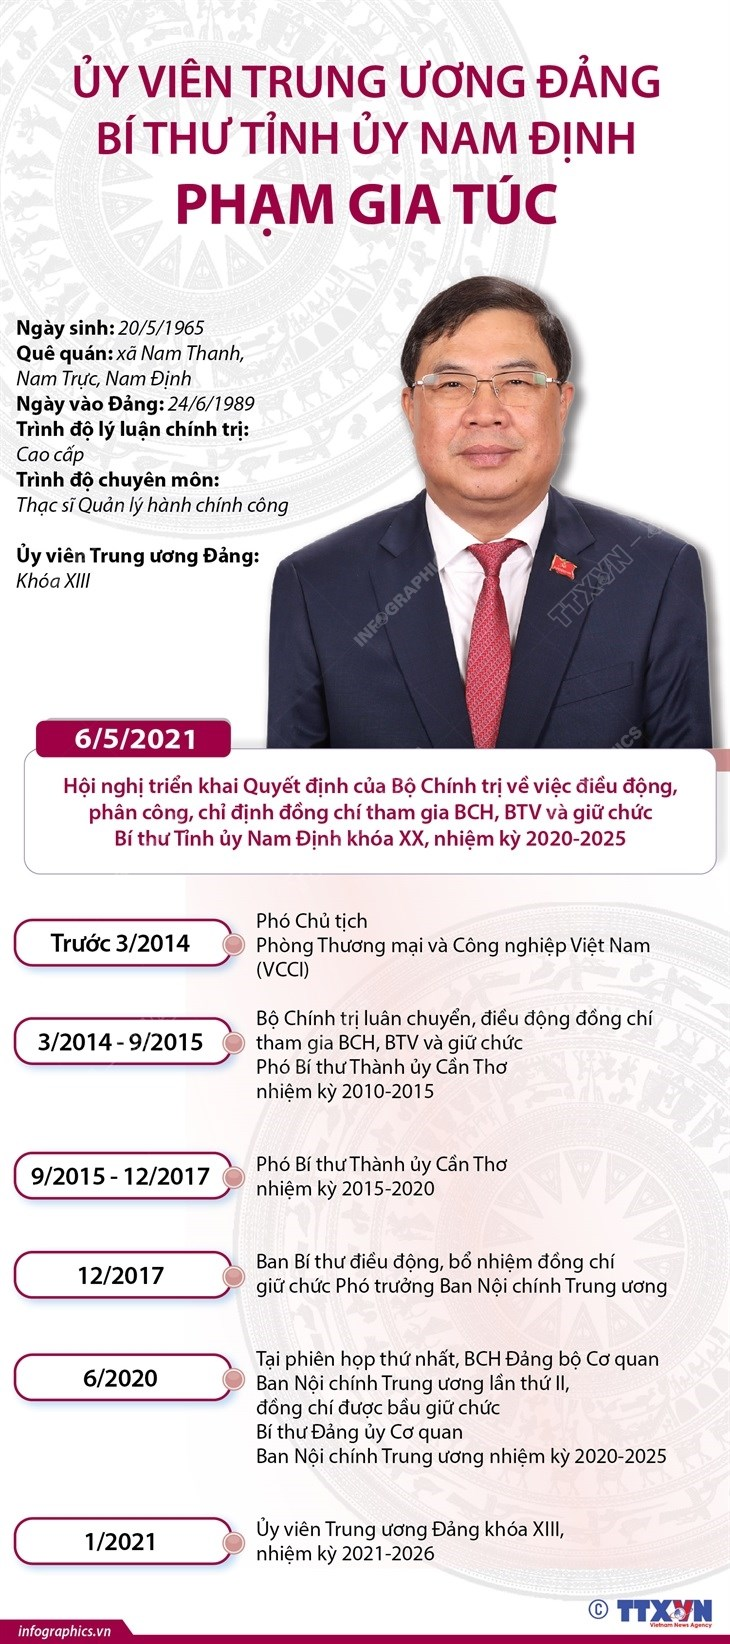 [Infographics] Uy vien TW Dang, Bi thu Tinh uy Nam Dinh Pham Gia Tuc hinh anh 1